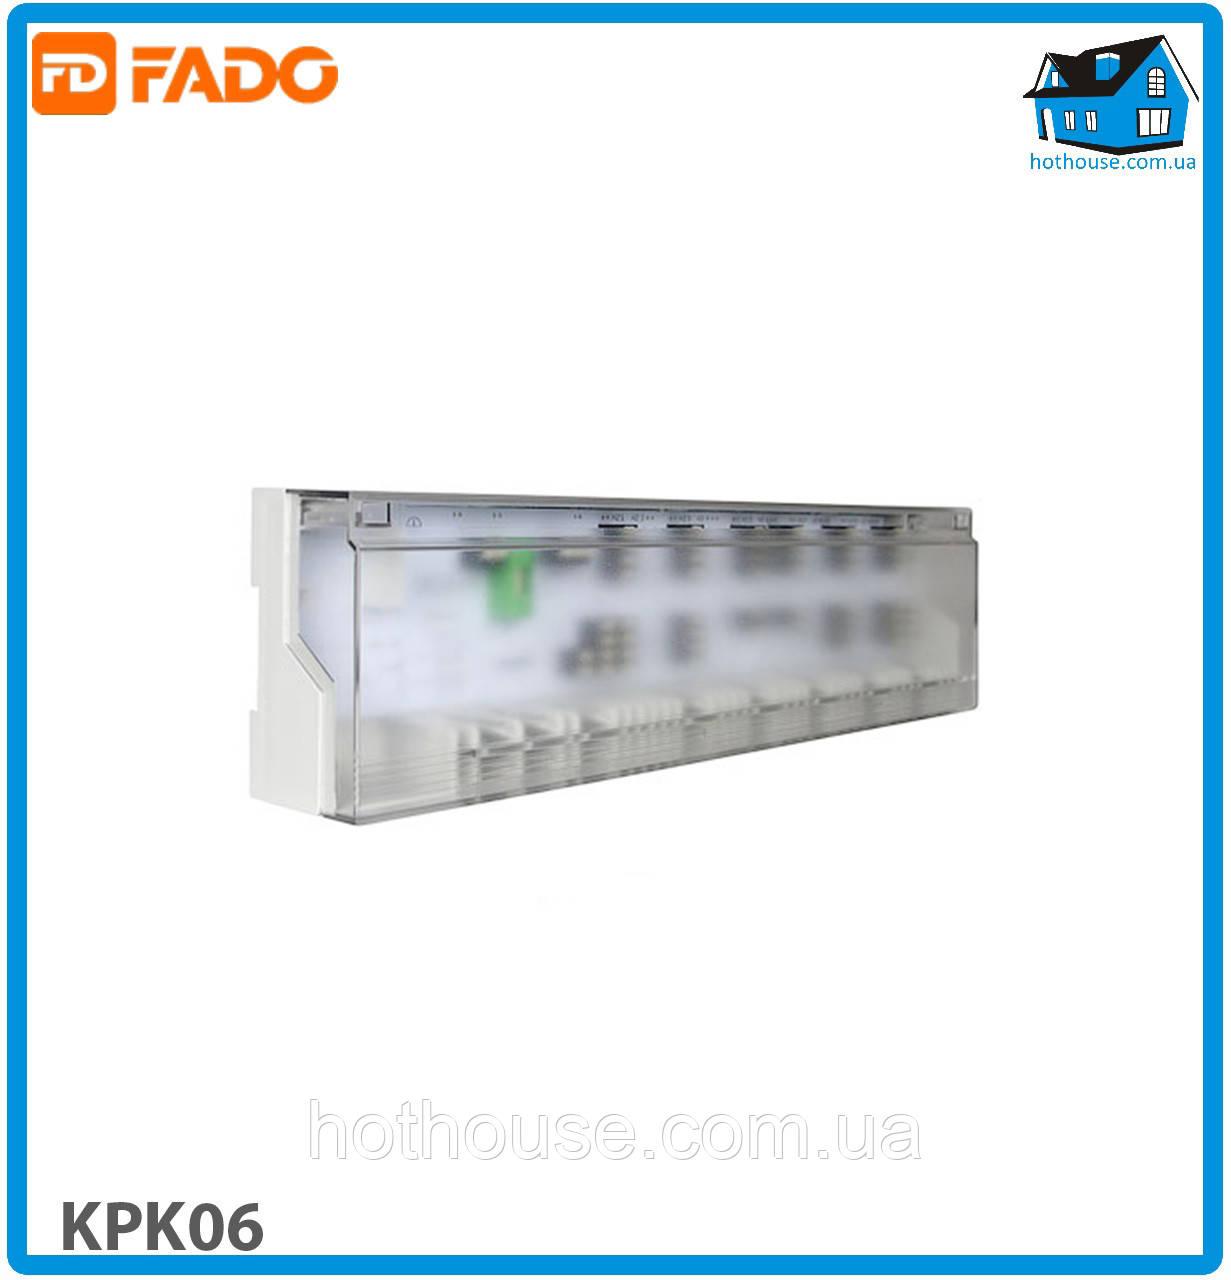 Колодка клемна FADO KPK06 FLOOR 24/220V 6 зон